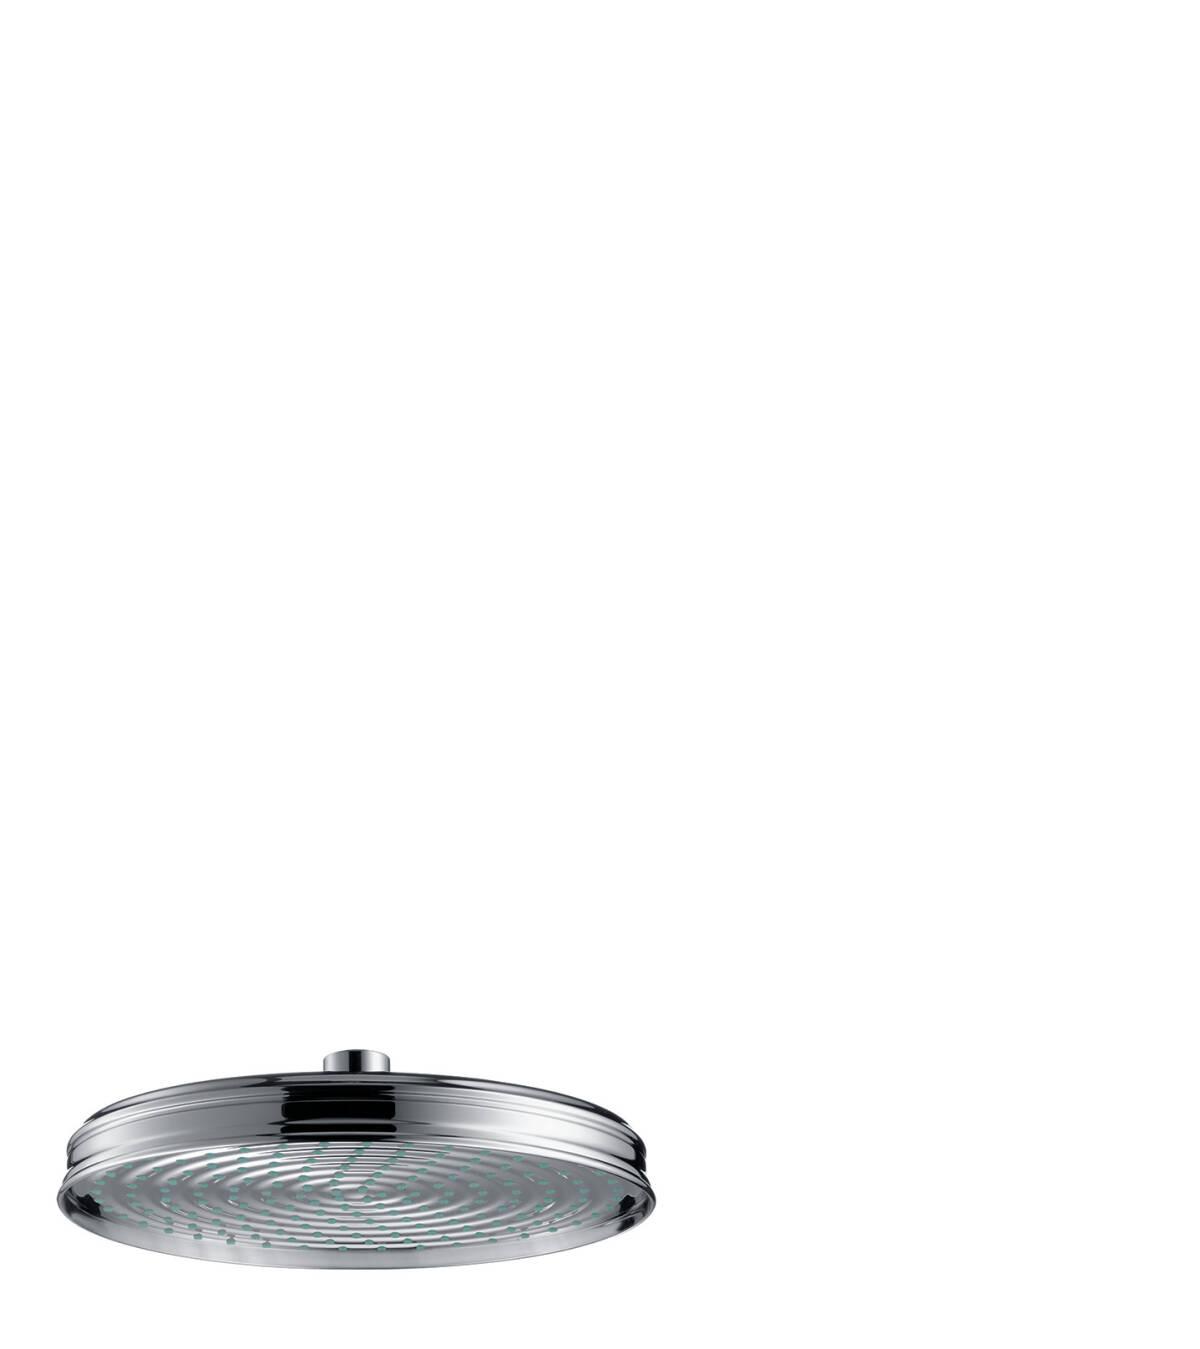 Overhead shower 240 1jet Classic, Polished Bronze, 28474130